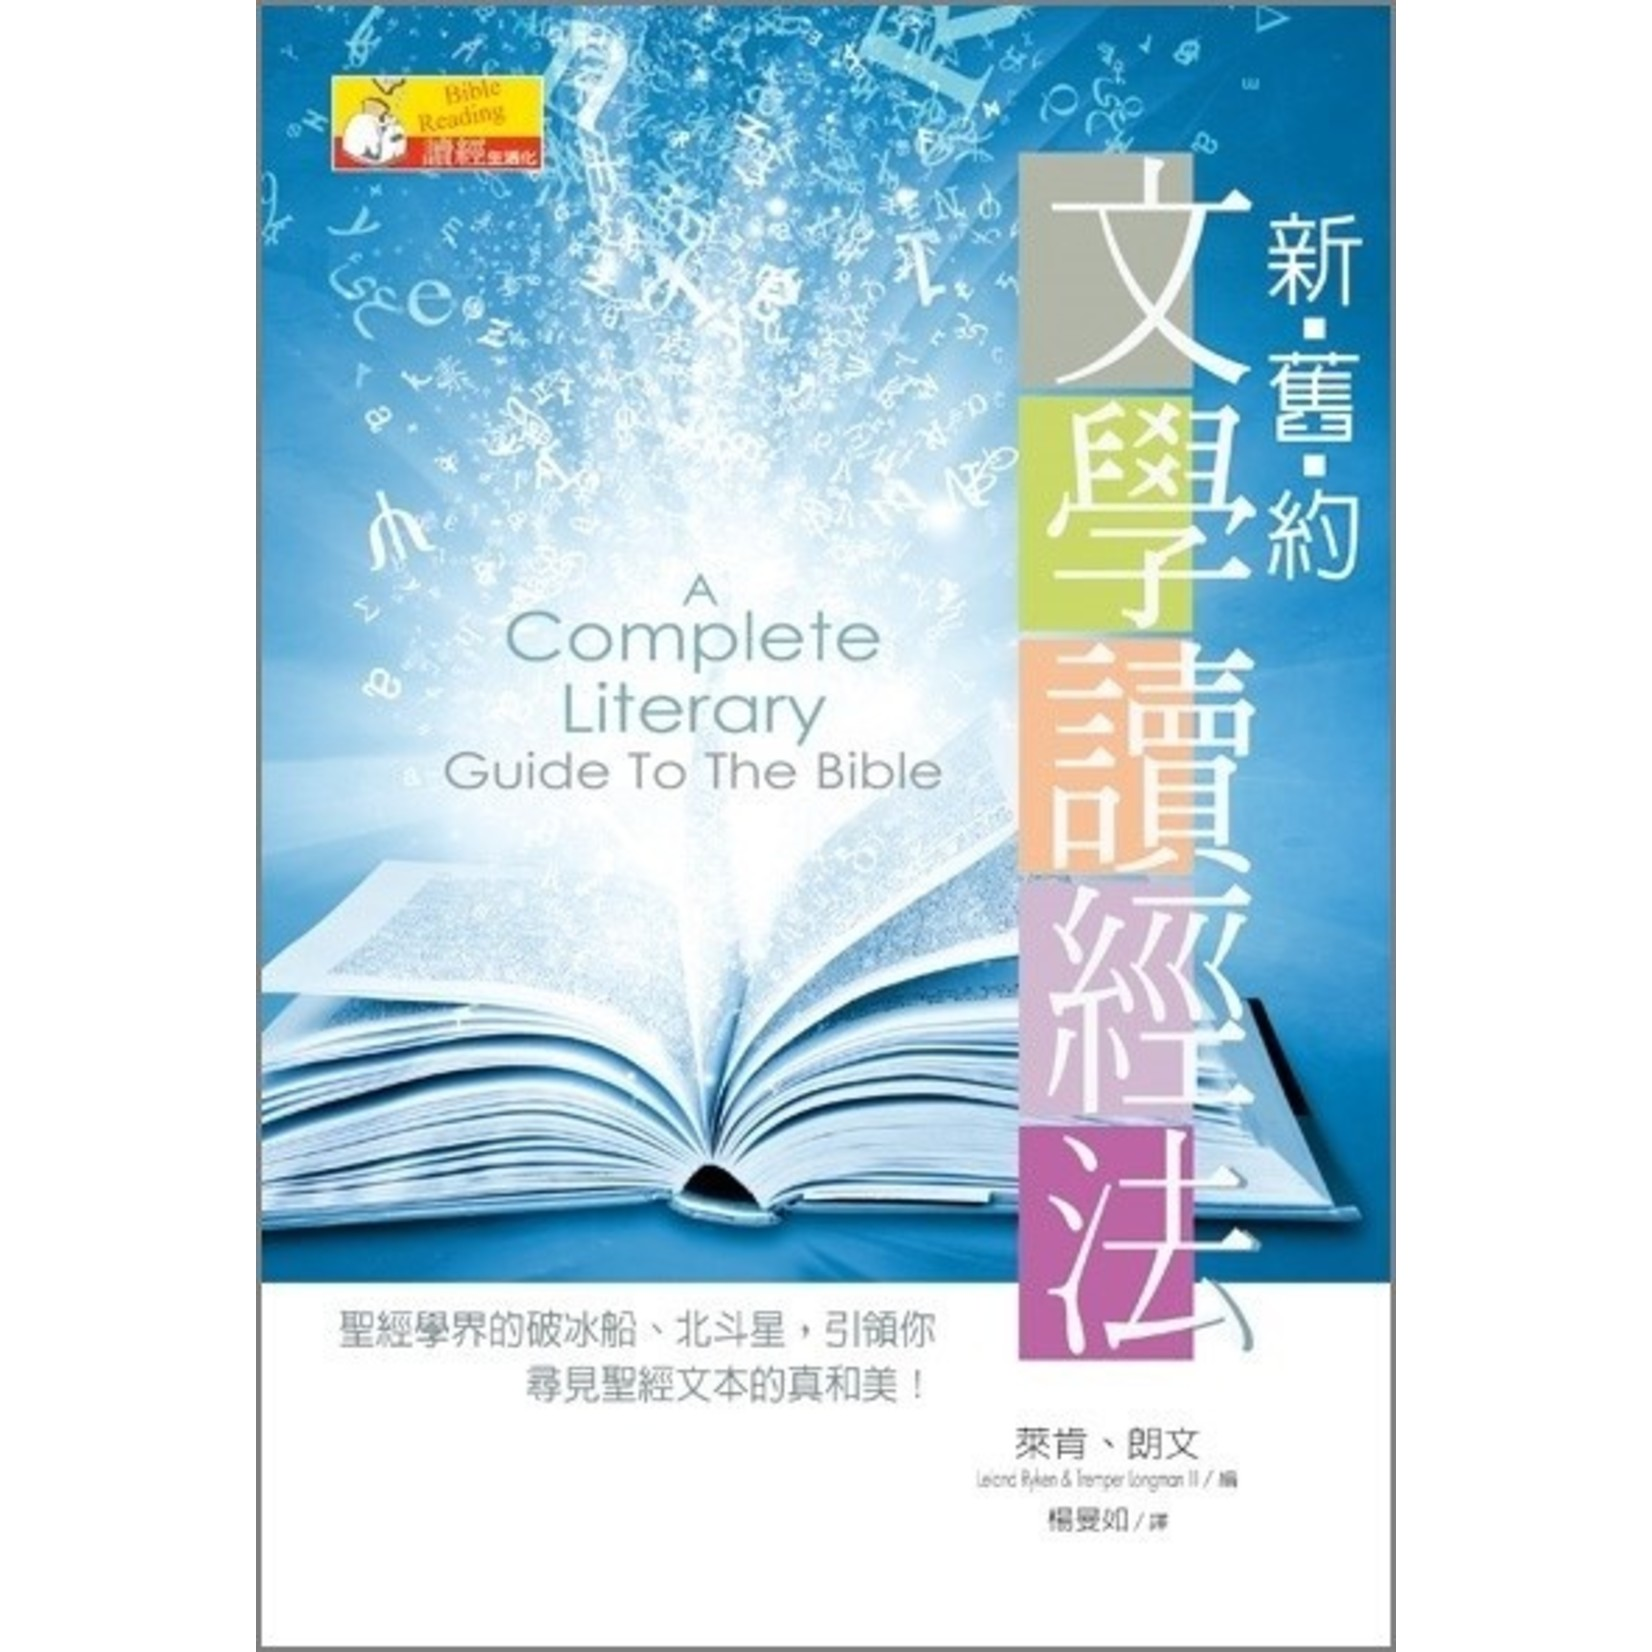 校園書房 Campus Books 新舊約文學讀經法 A Complete Literary Guide To The Bible